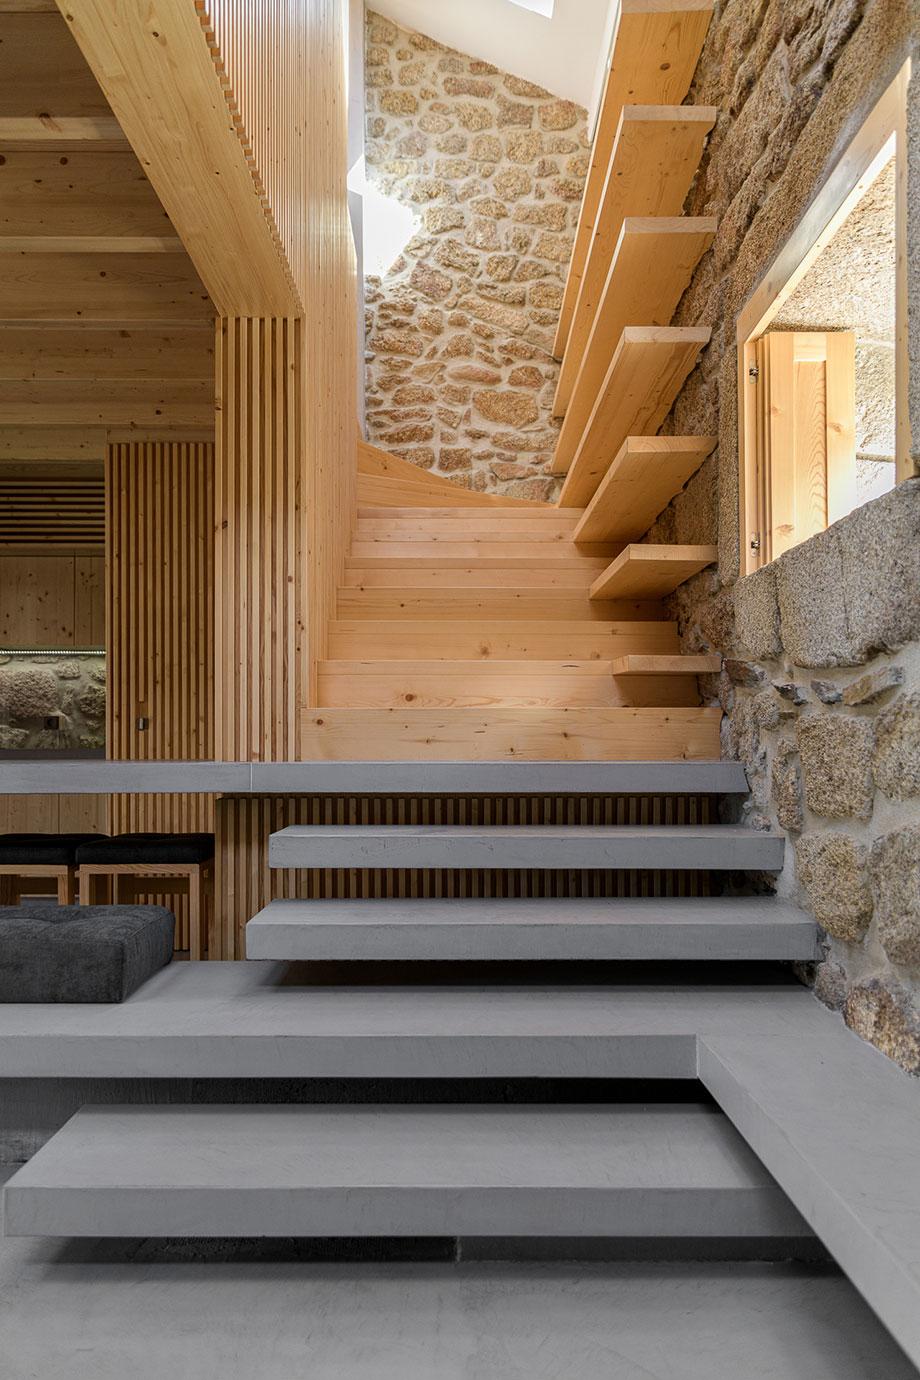 casa rural en portugal de hbg architects (8) - foto ricardo oliveira alves